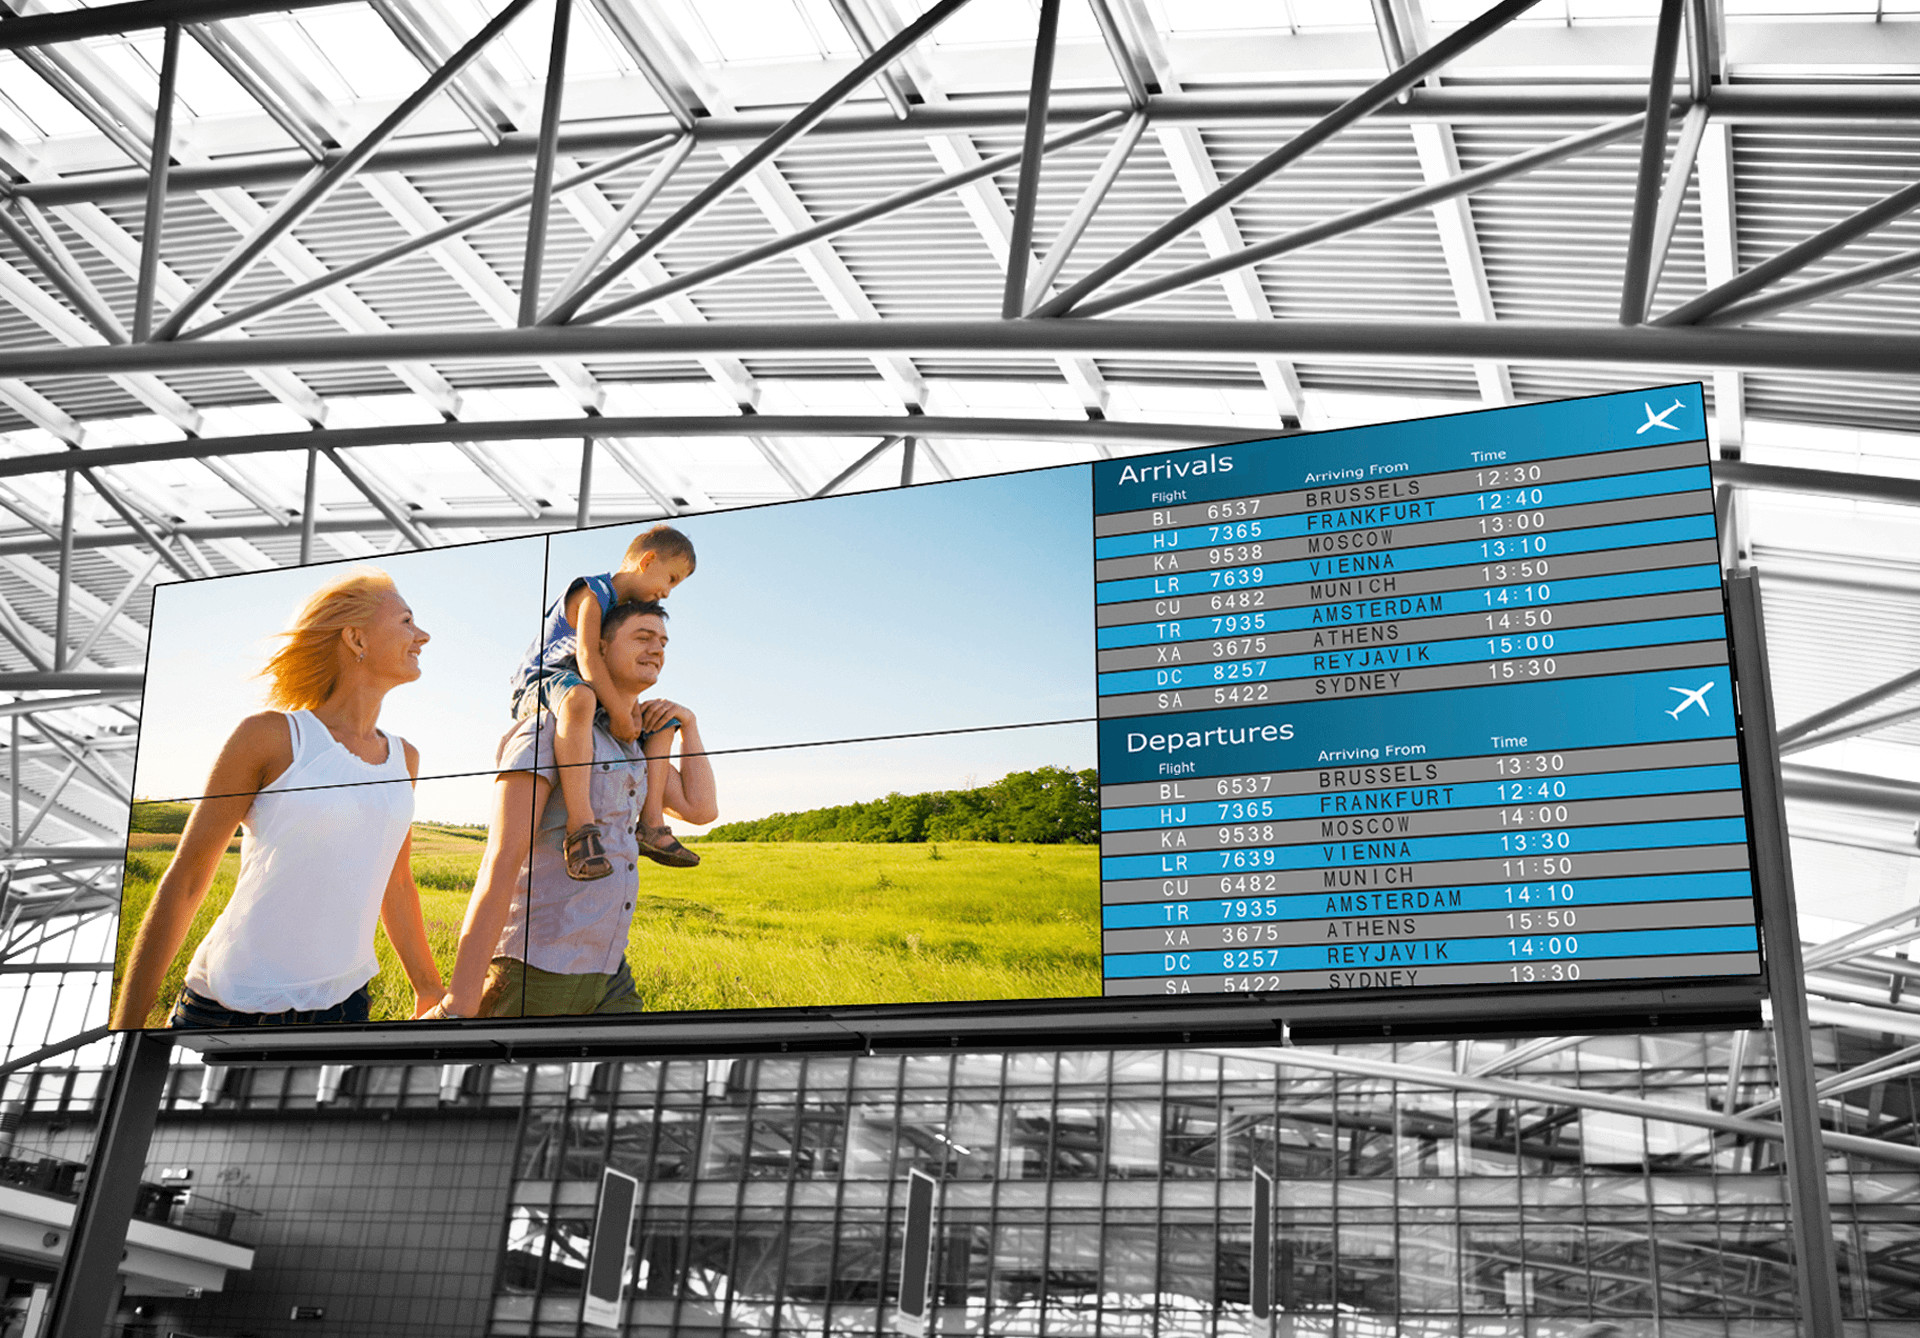 clarity-matrix-hx60-airport-planar